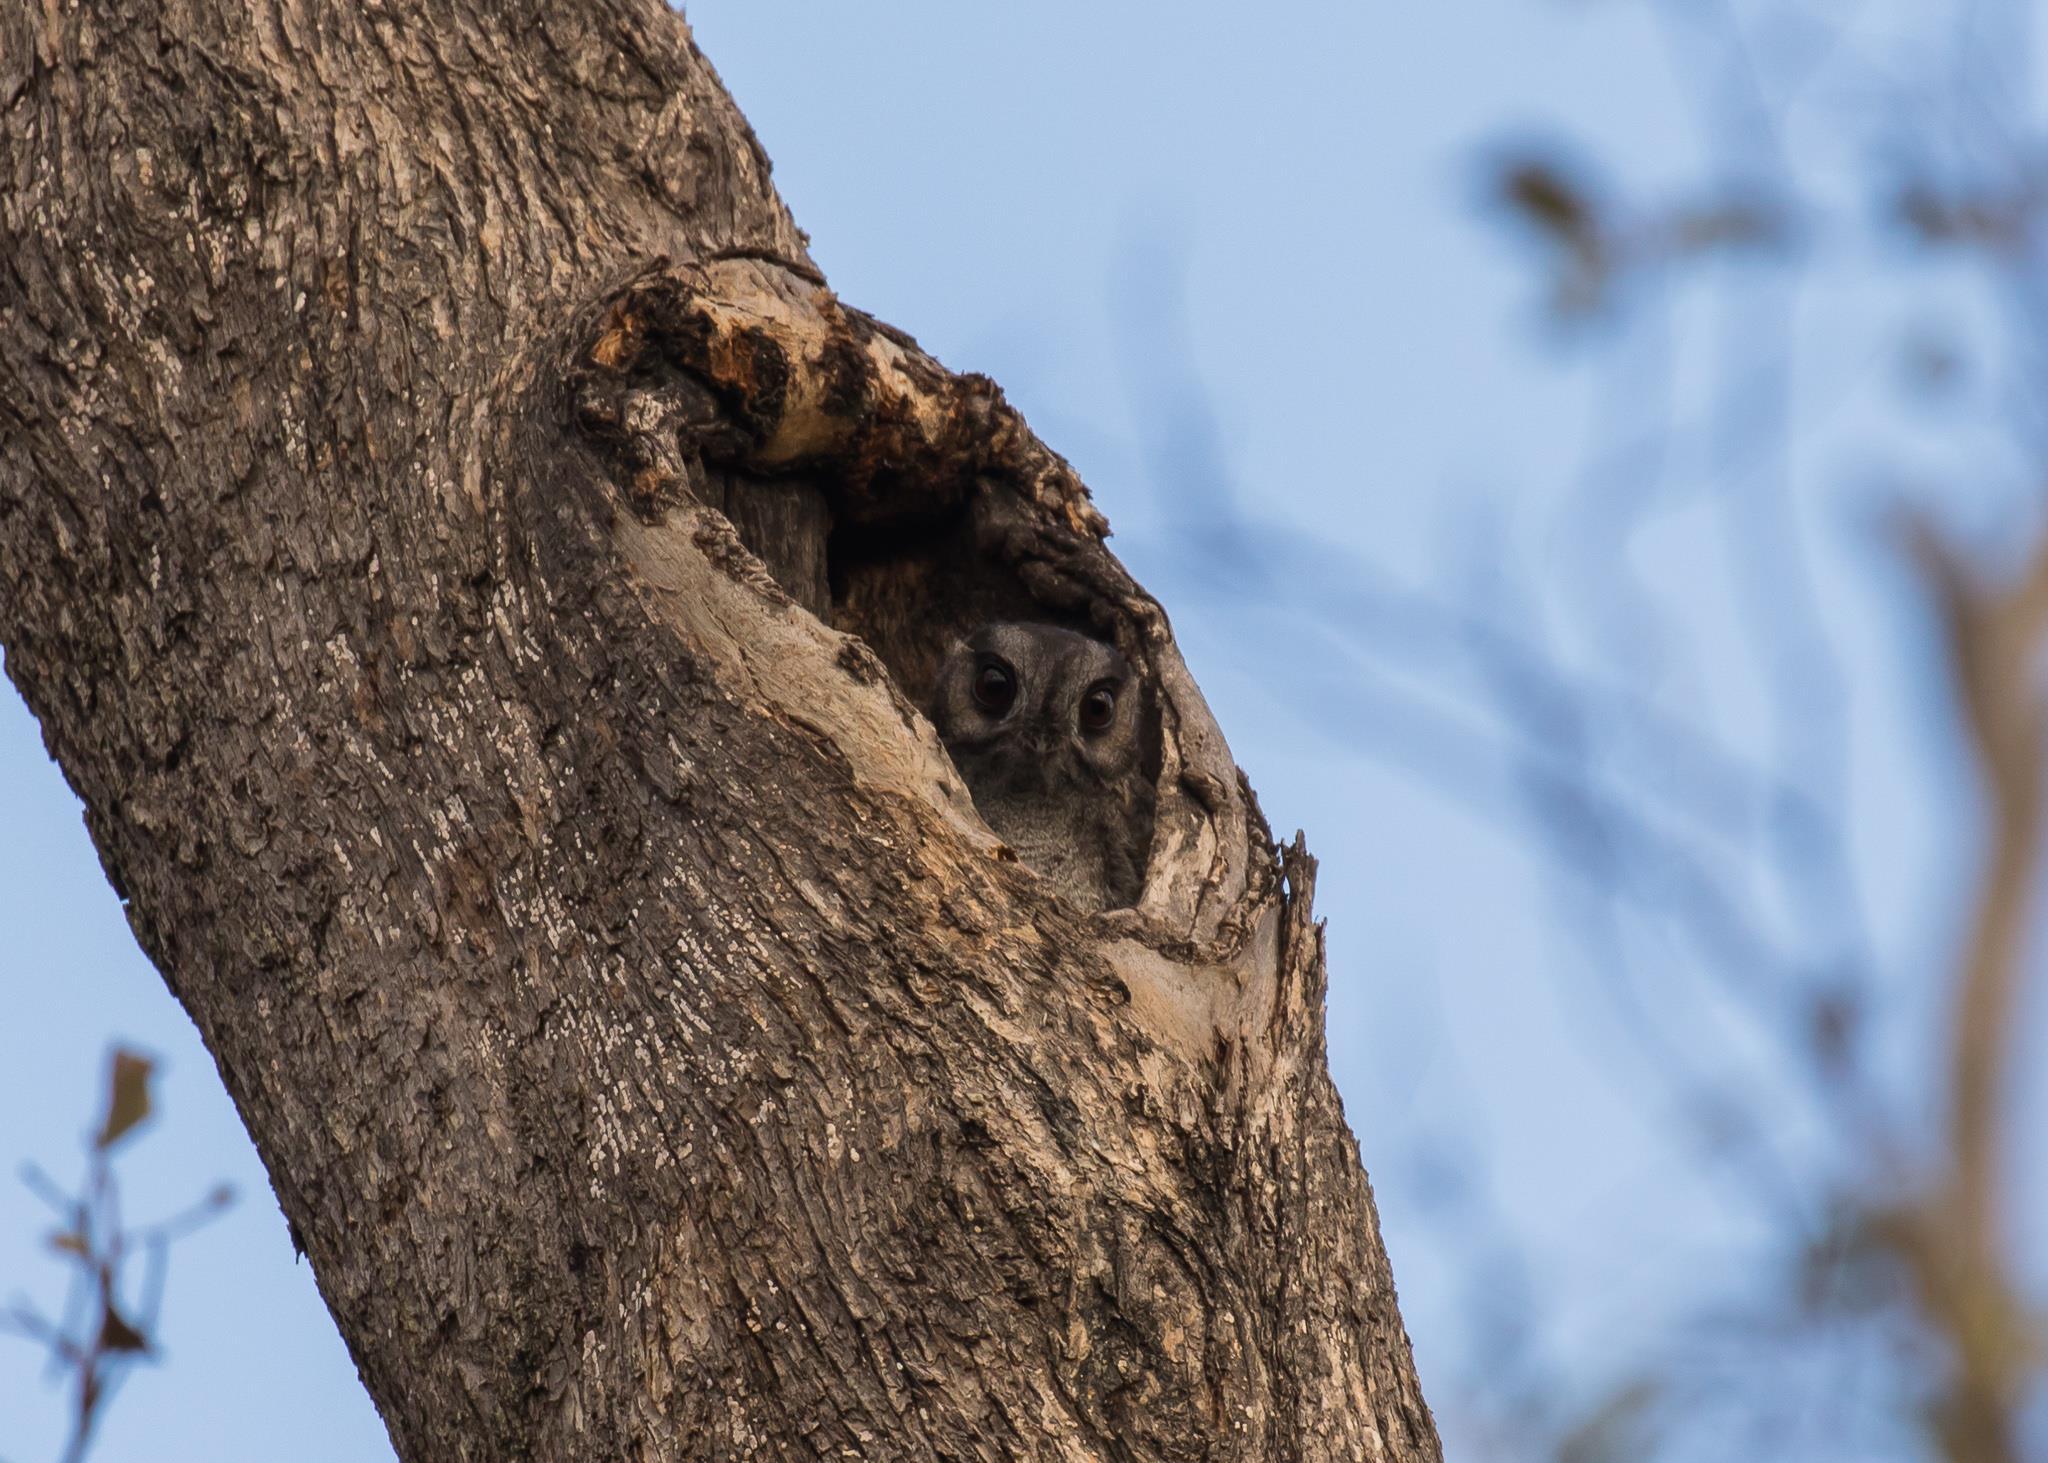 Australian Owlet-nightjar tree